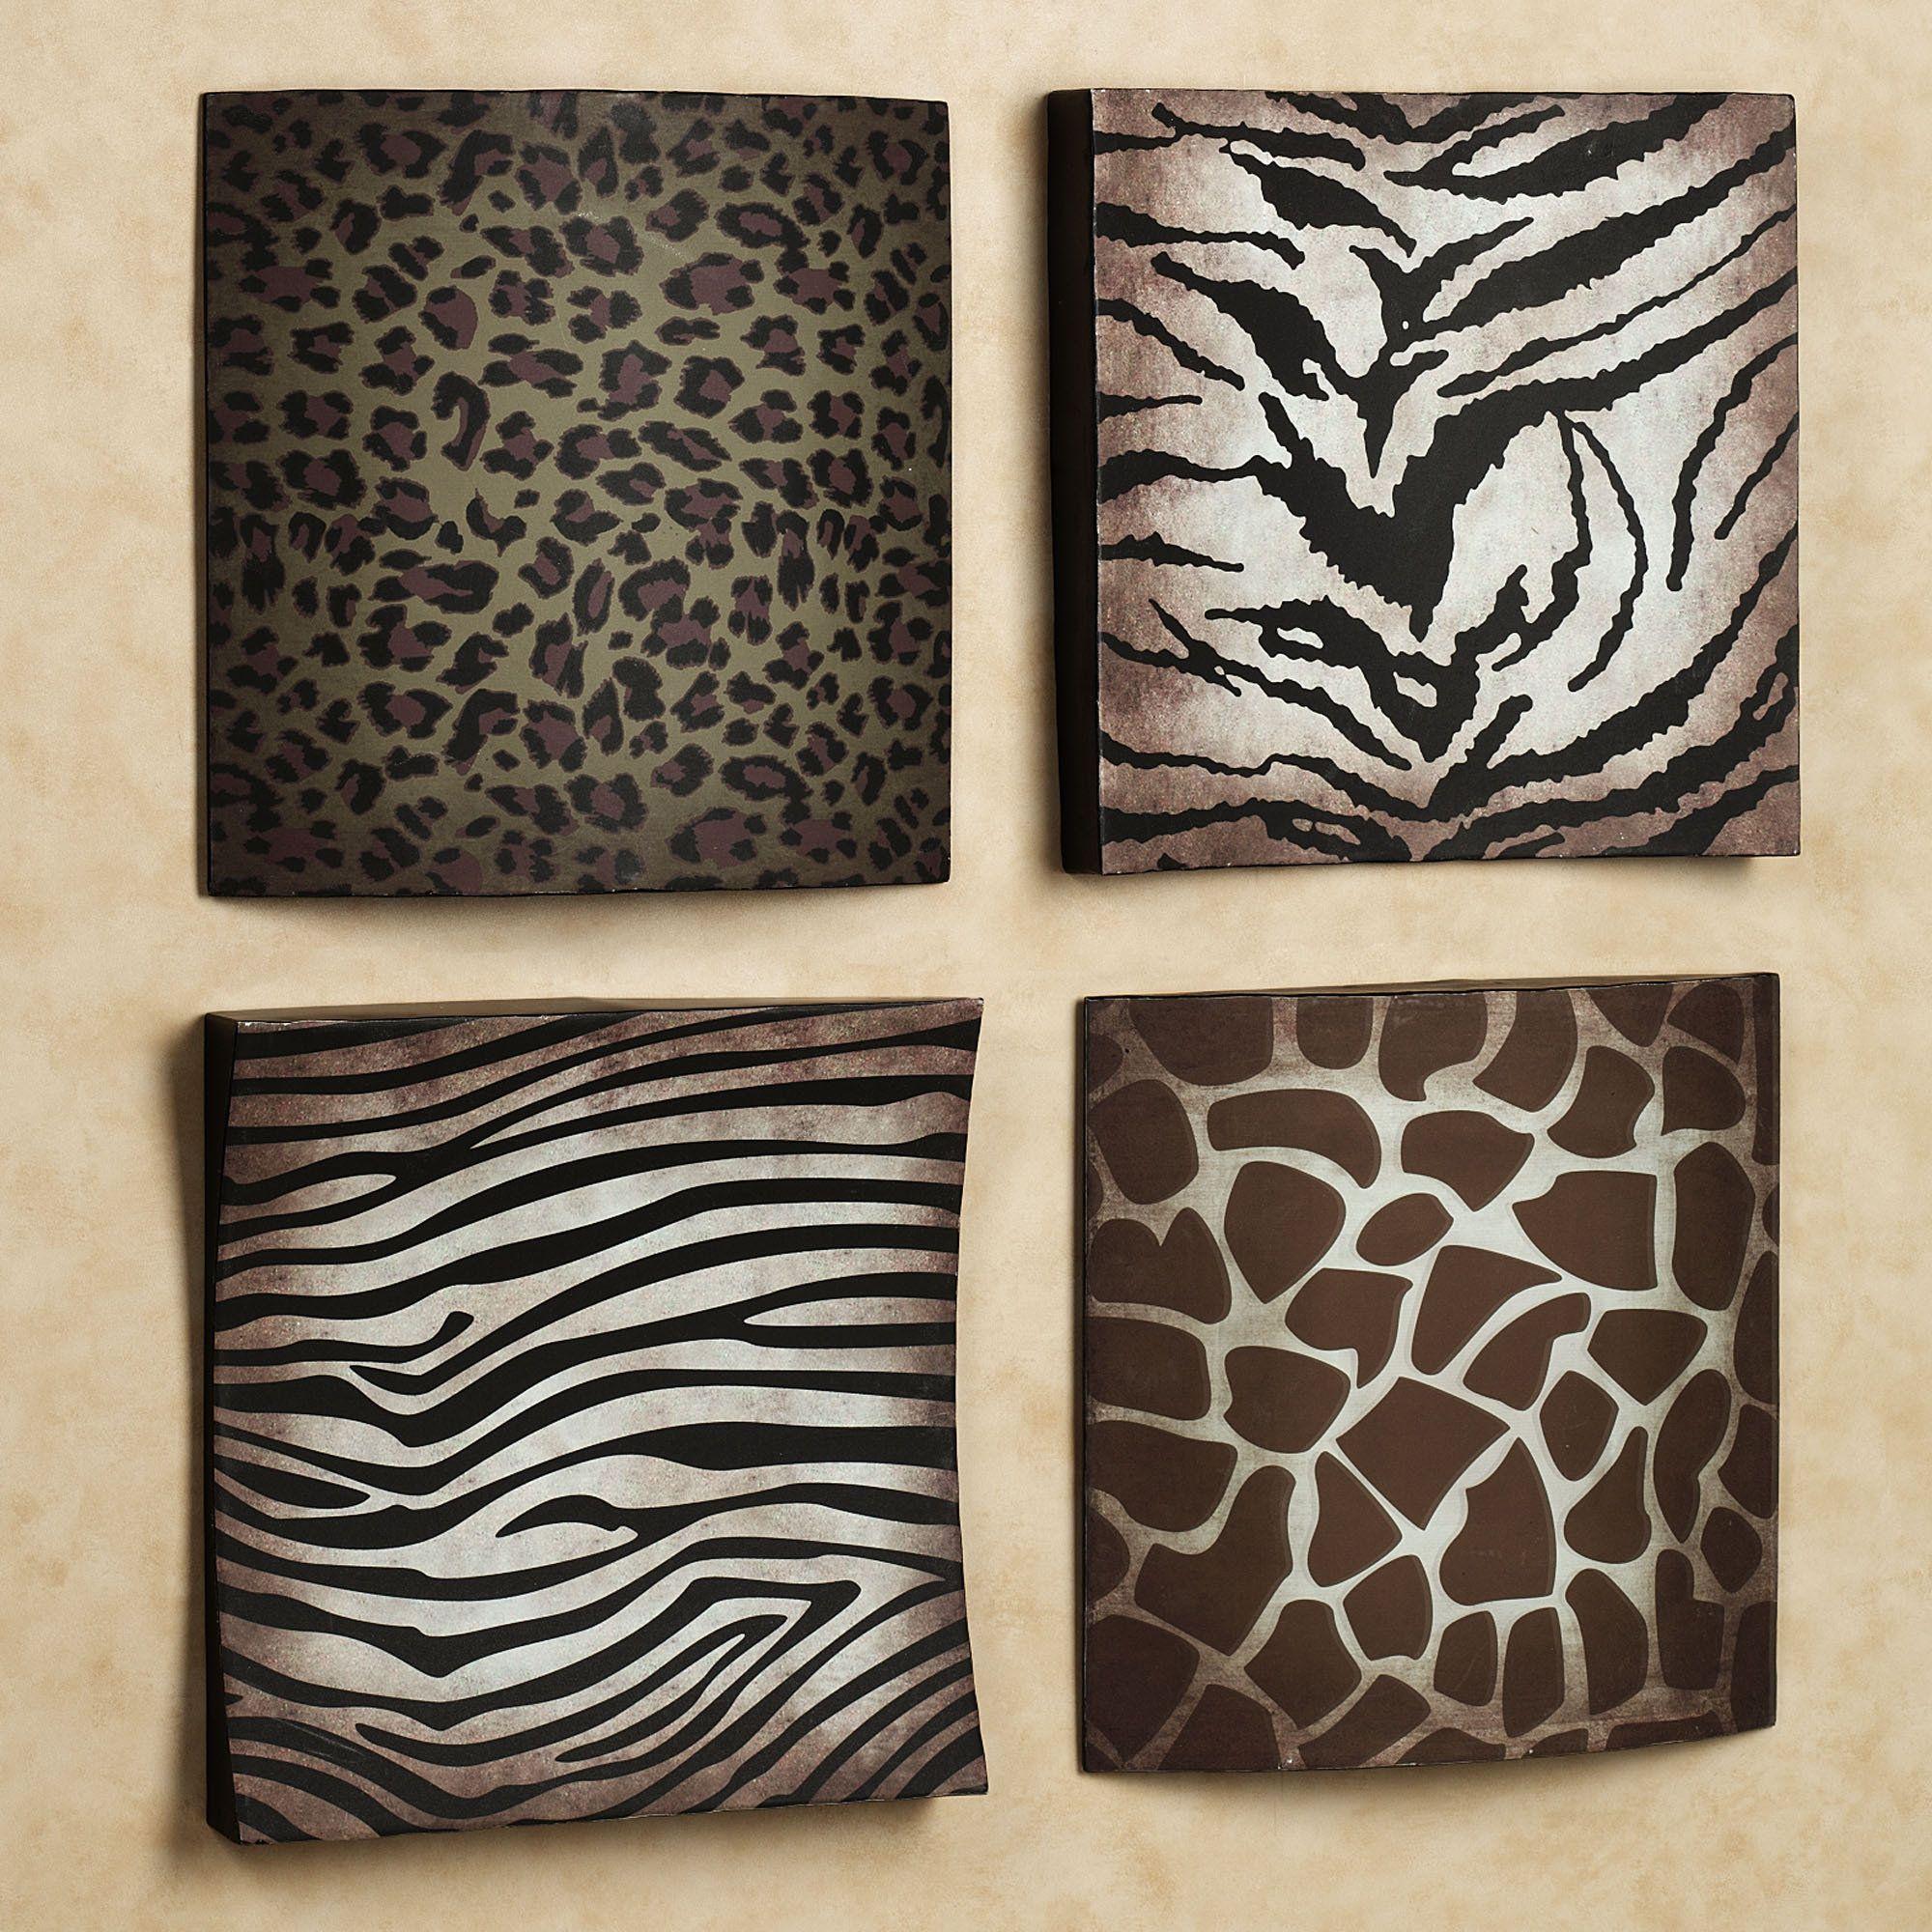 bedroom wall plaques. Safari Animal Prints Metal Wall Plaque - Love These Frames Bedroom Plaques E